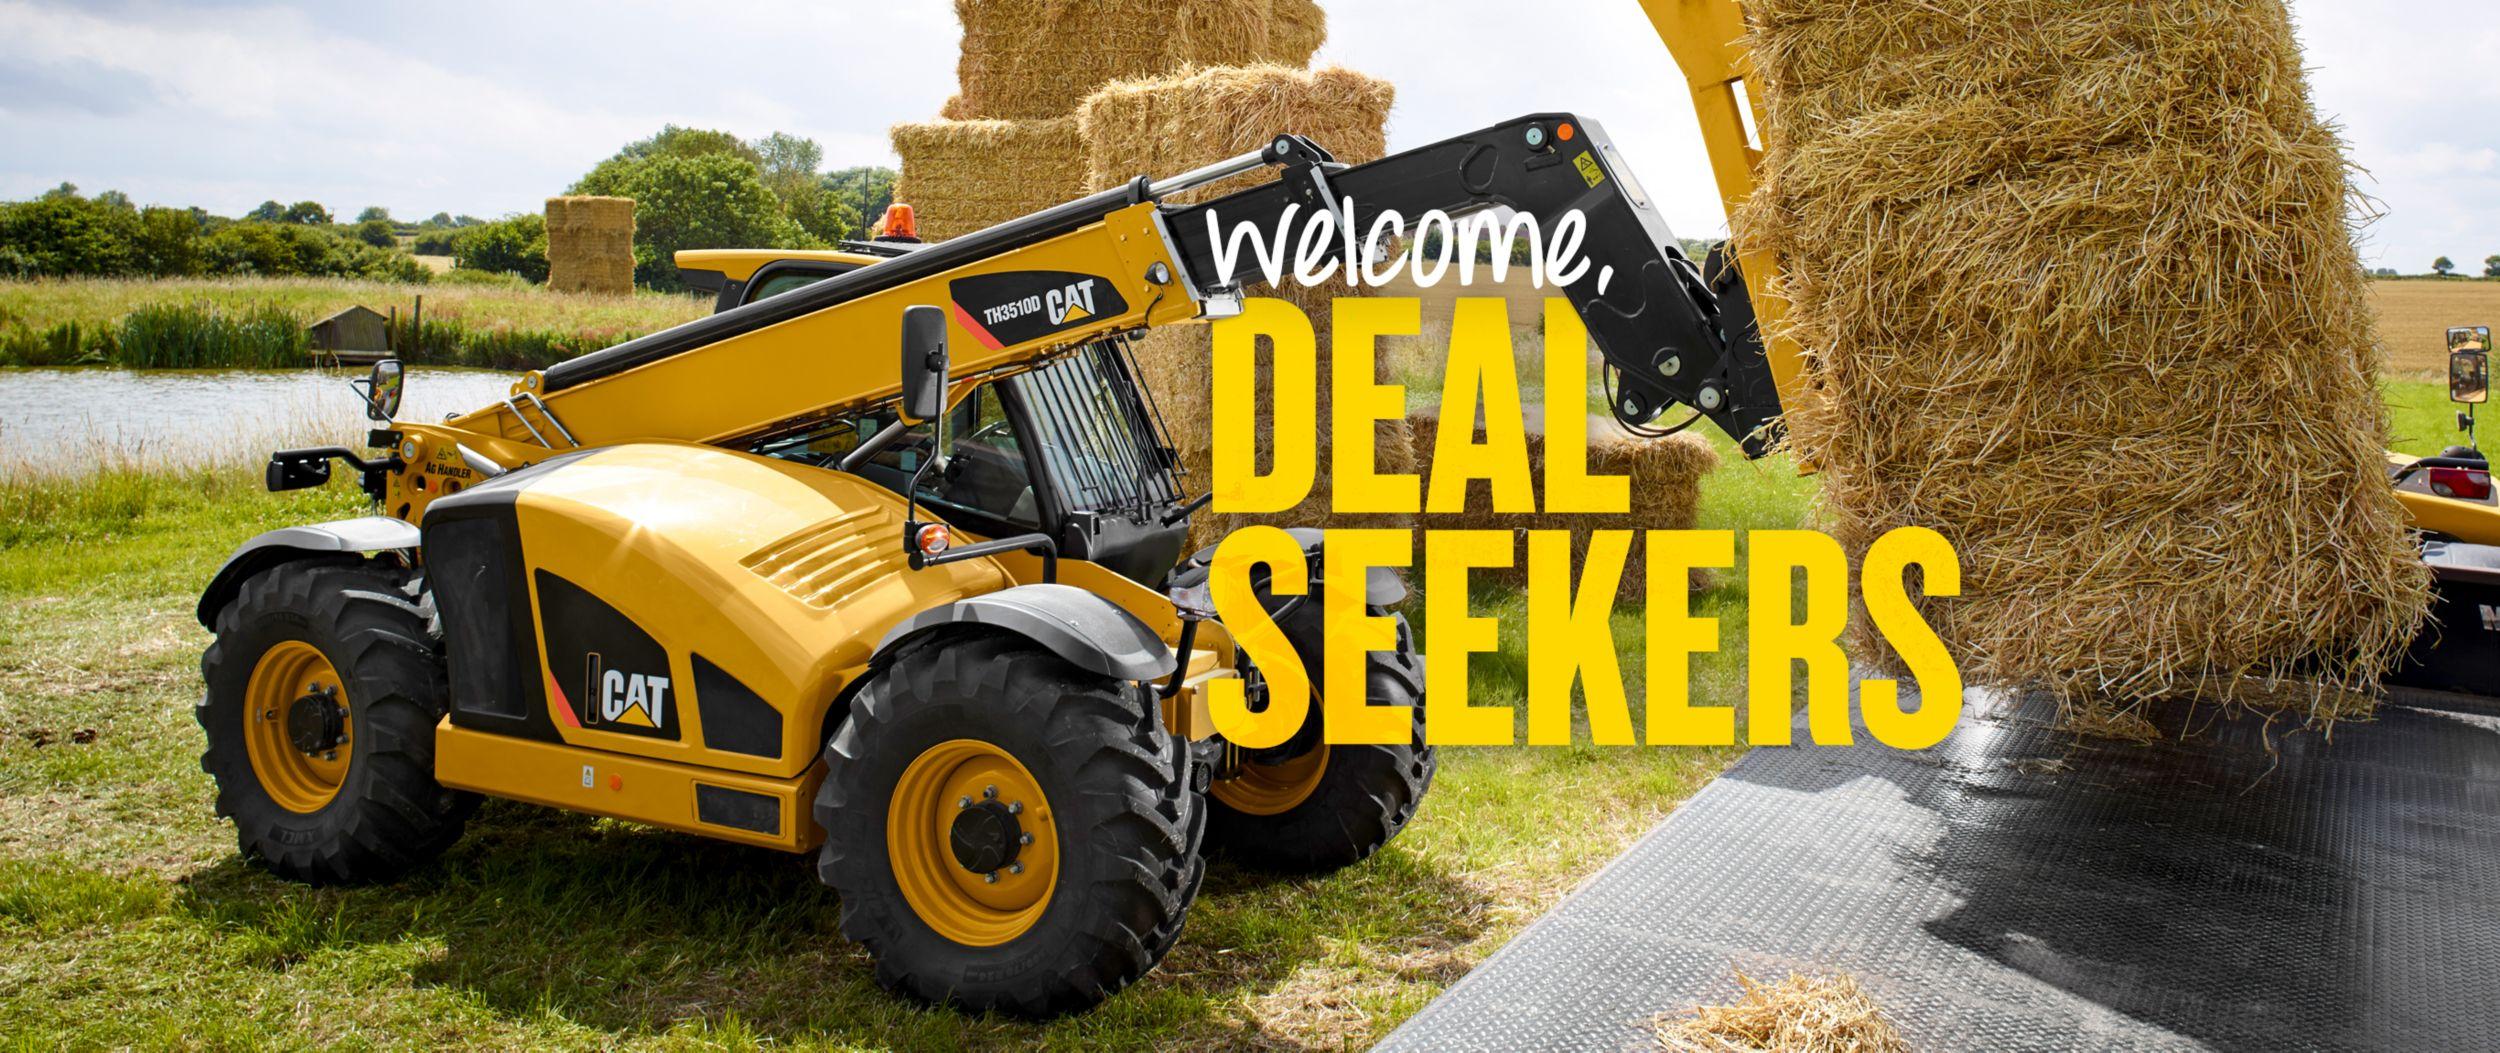 Cat Telehandler - Welcome, Deal Seekers